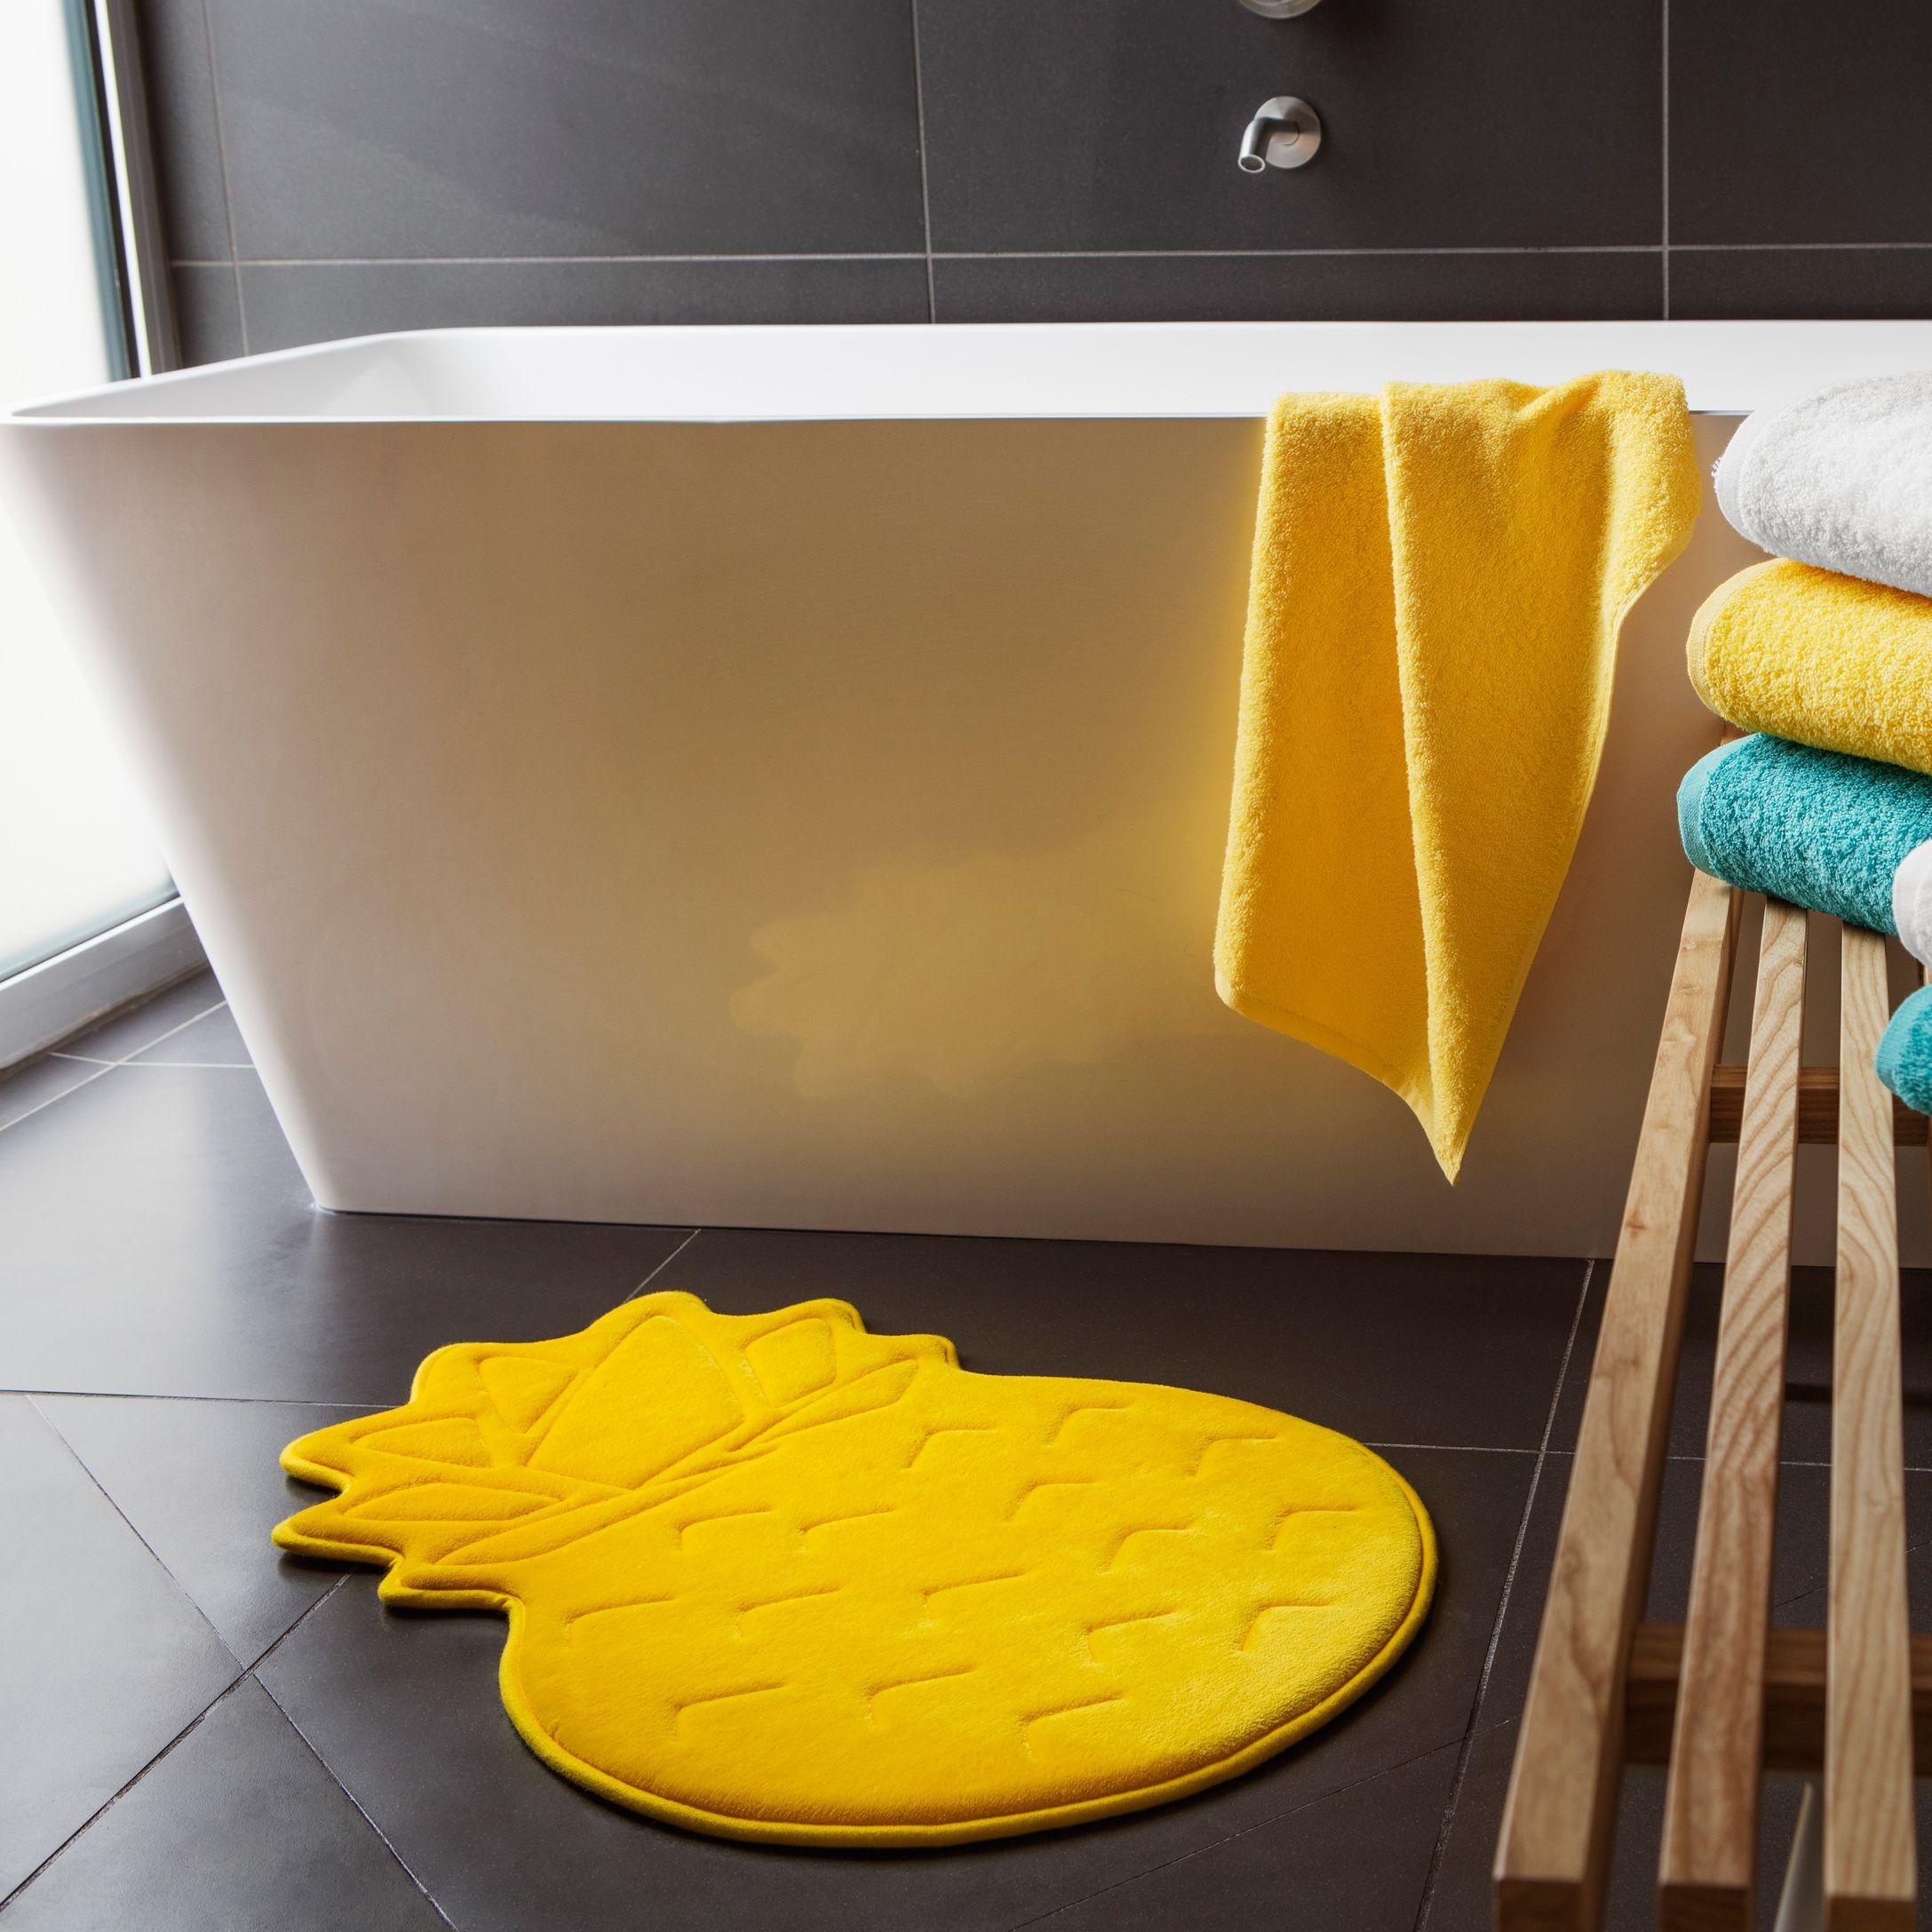 Pineapple memory foam bath mat 47 x 70 cm in 2018 | Pineapple ...